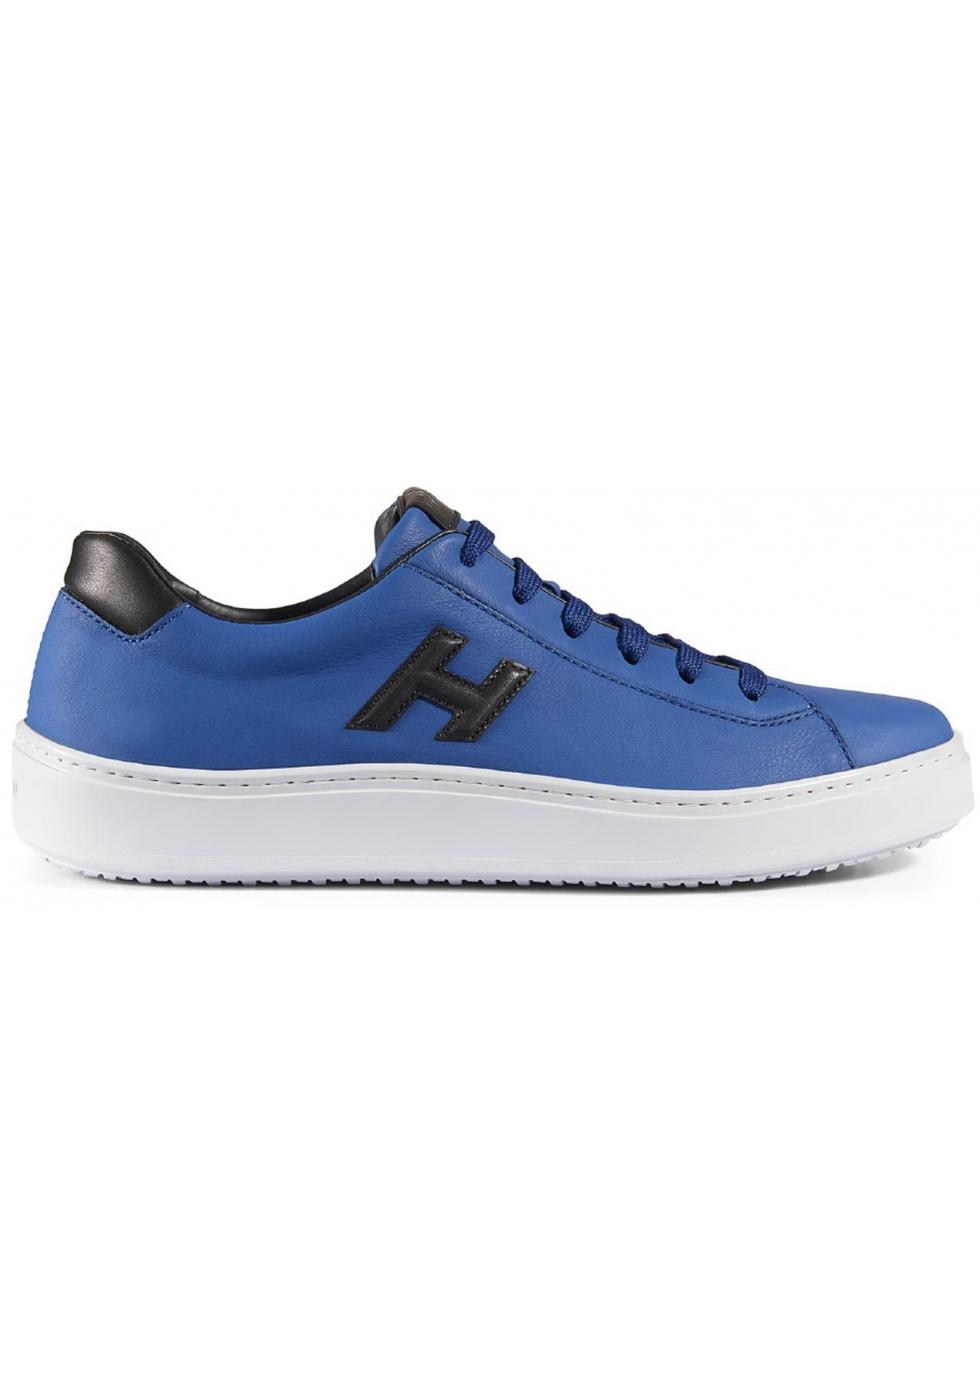 Sneakers Hogan H302 realizzate in pelle celeste - Italian Boutique